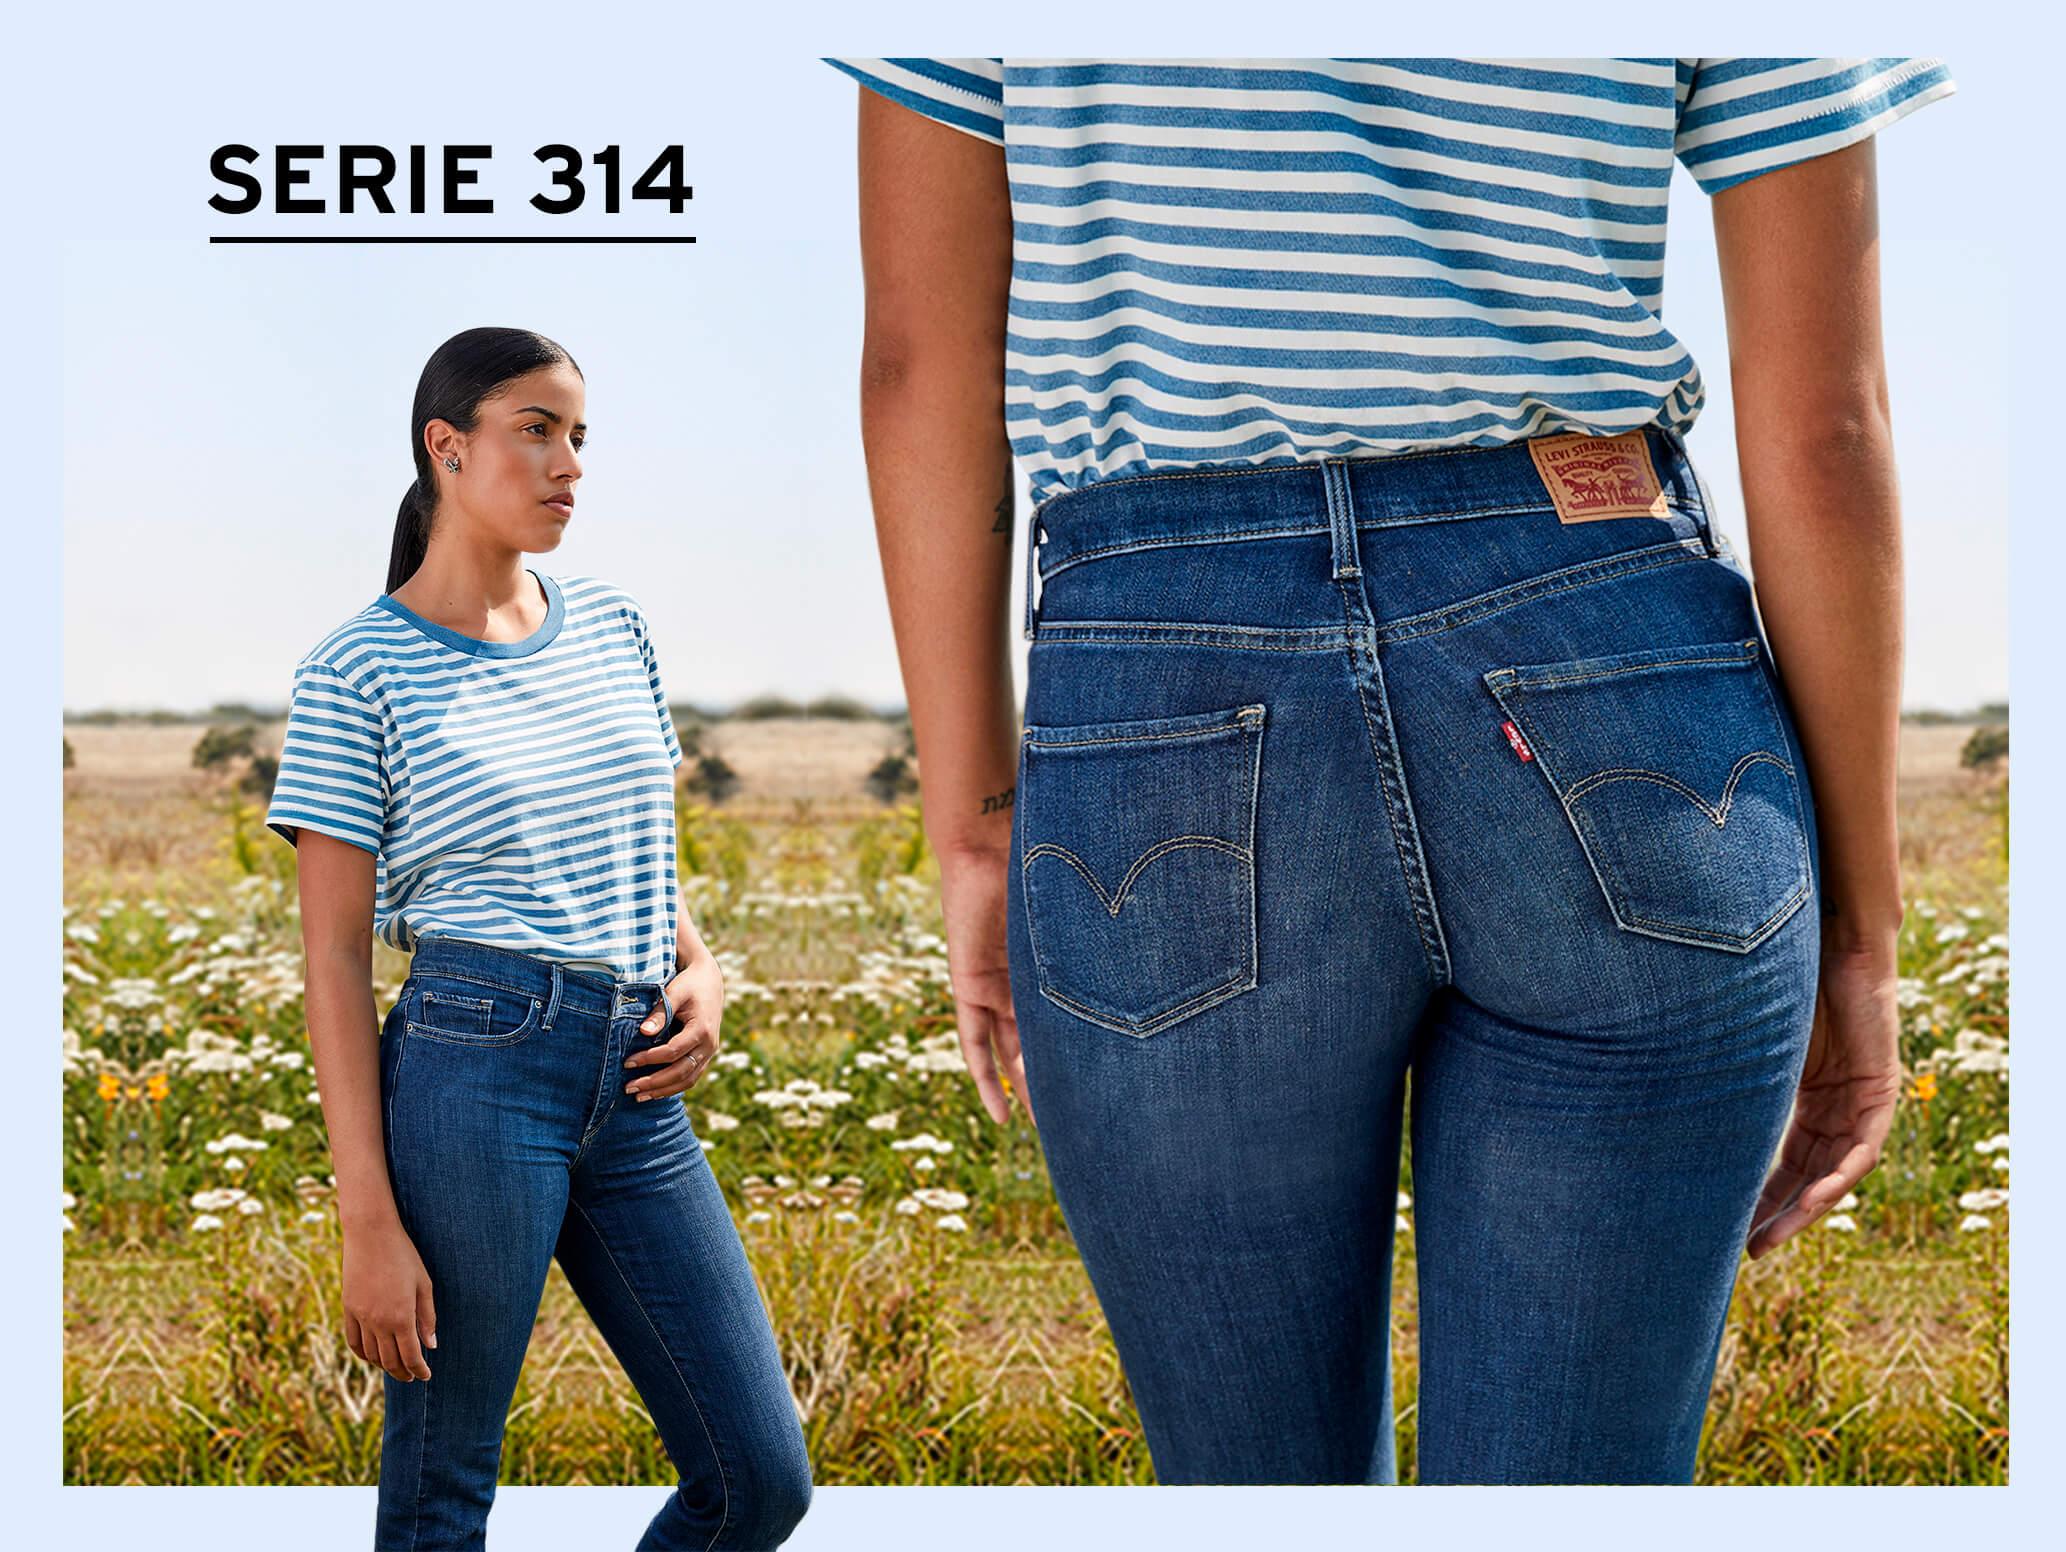 SERIE 300 LEVI'S denim jeans levi's